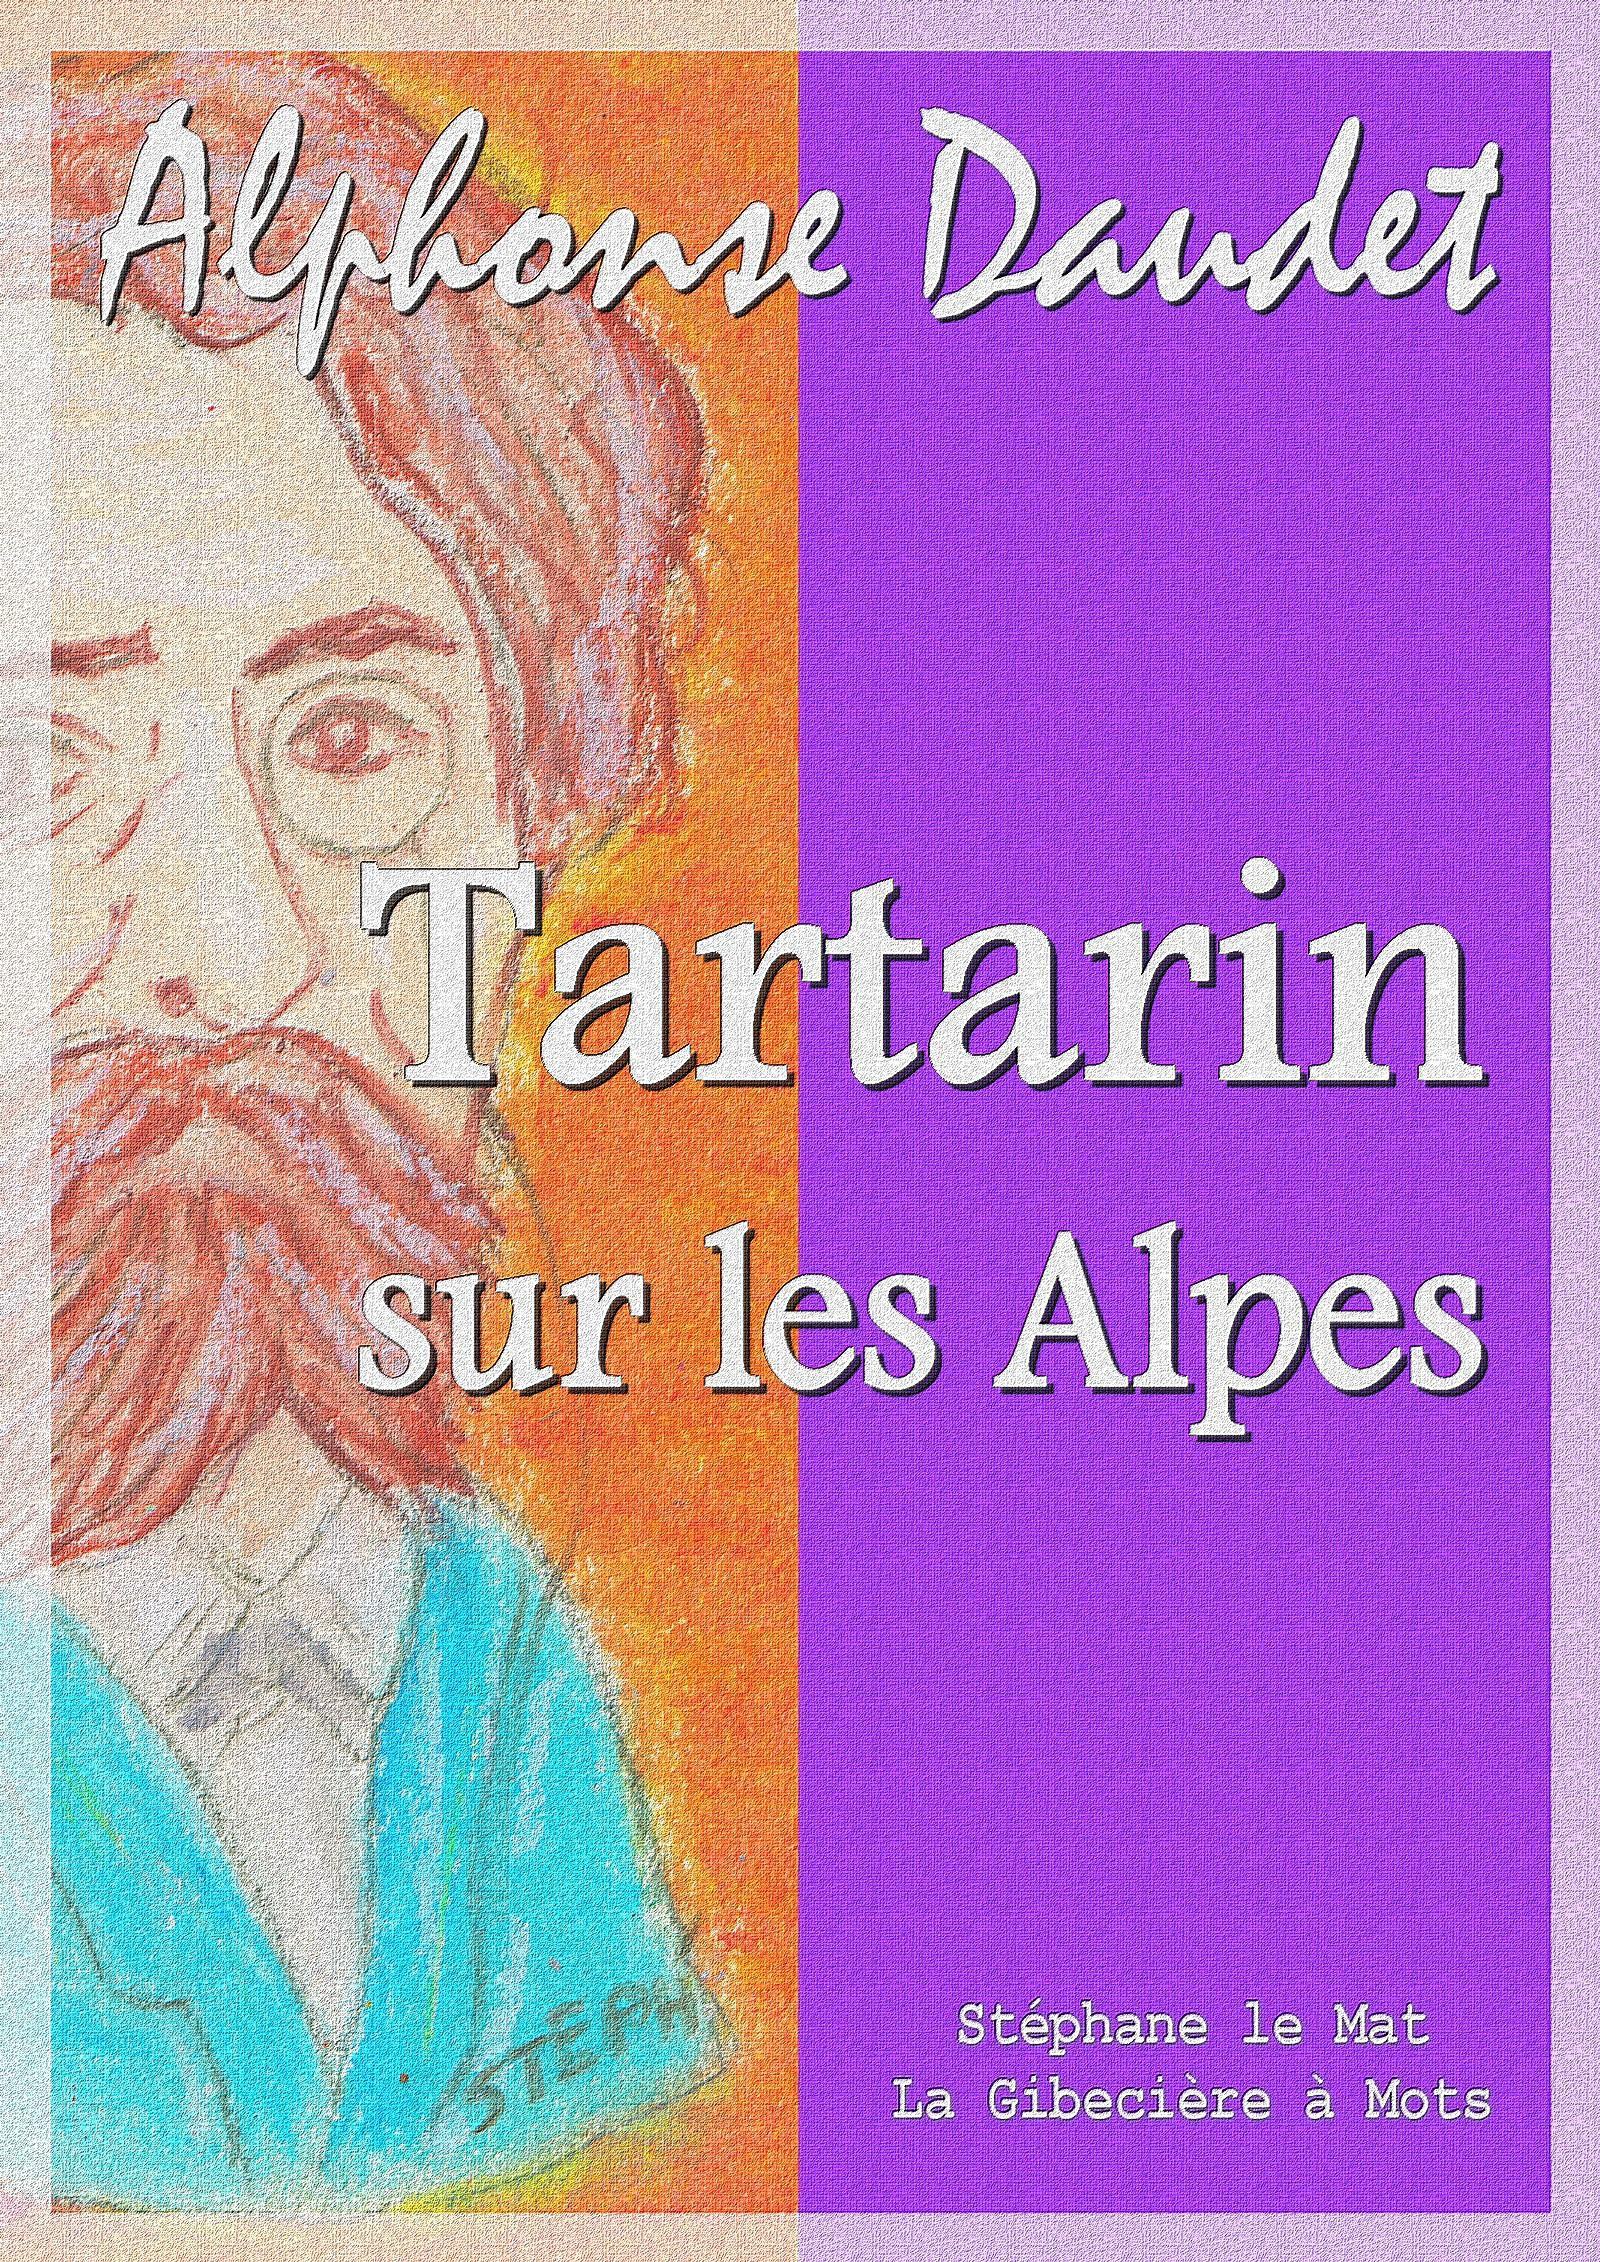 Tartarin sur les Alpes, NOUVEAUX EXPLOITS DU HÉROS TARASCONNAIS